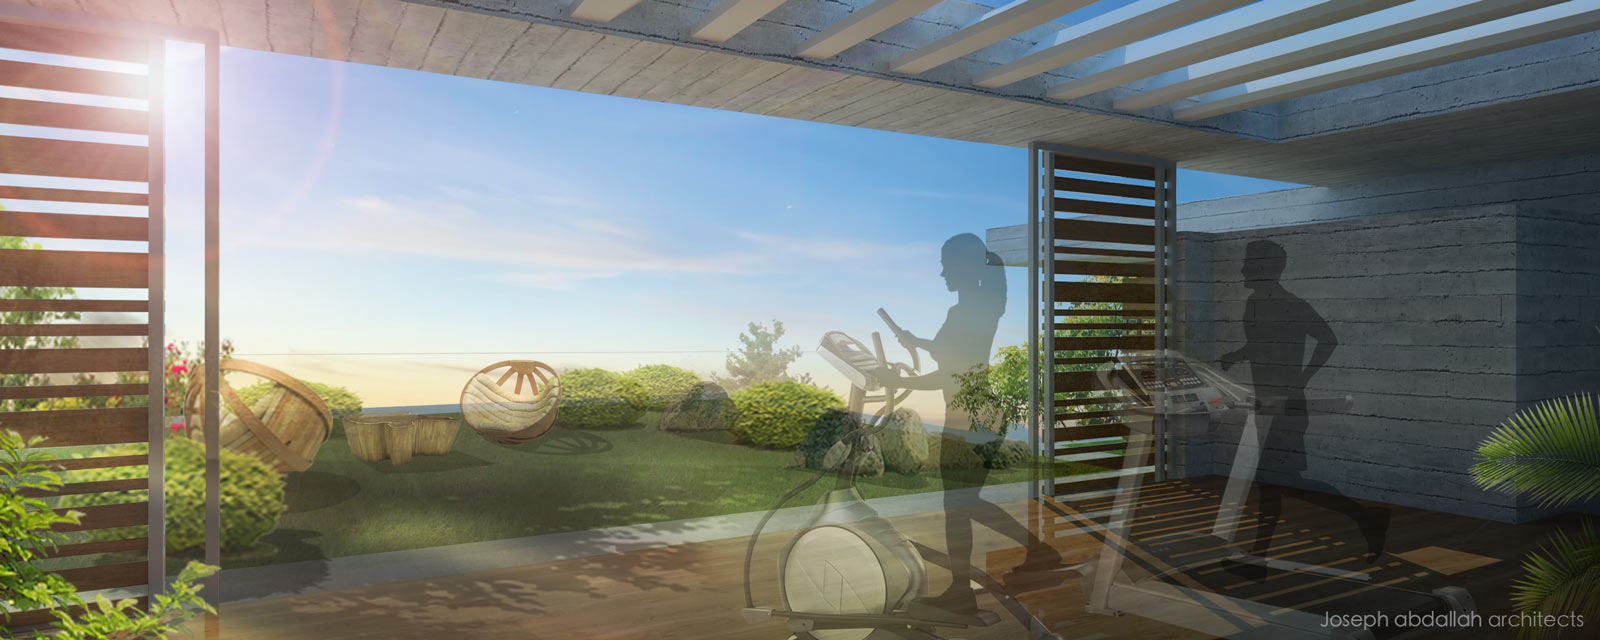 nassif-water-mirror-villa-lebanon-joseph-abdallah-architects-6